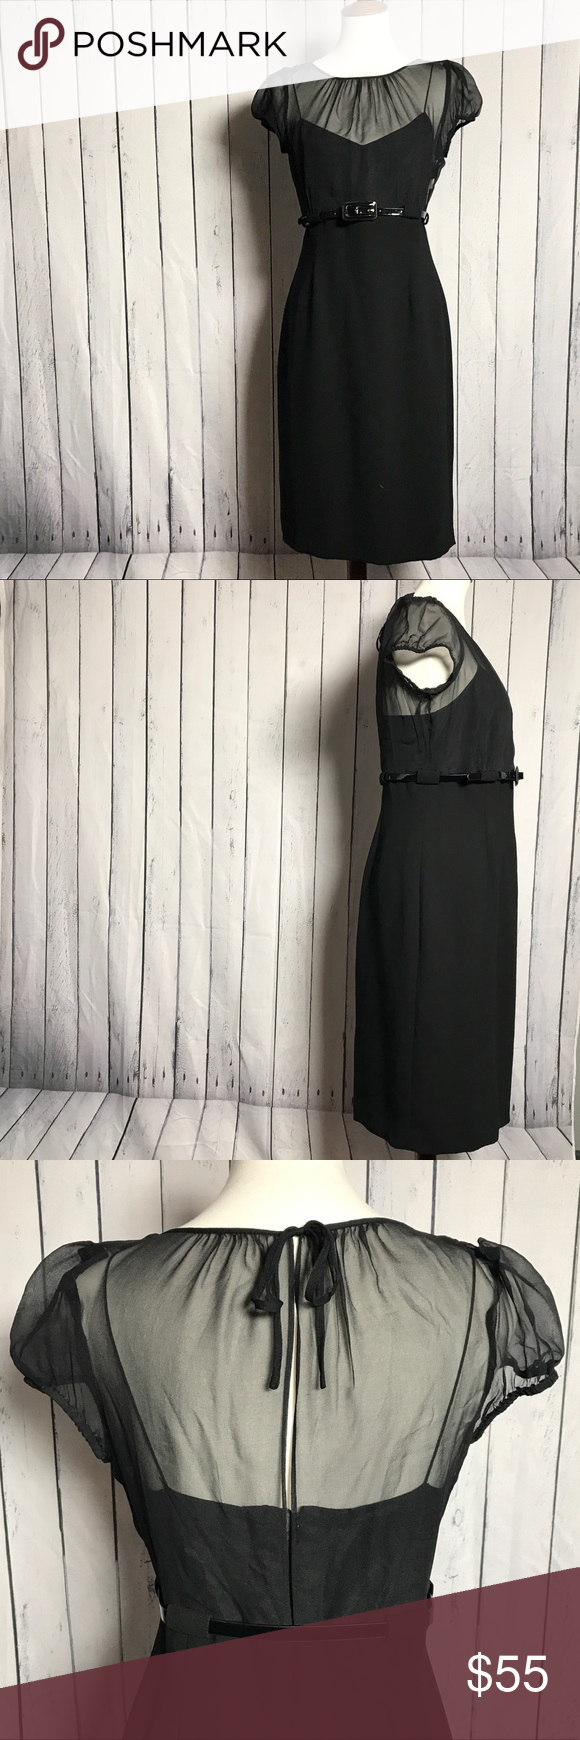 Nwt Calvin Klein Sheer Top Dress Sheer Top Dress Sheer Top Calvin Klein [ 1740 x 580 Pixel ]